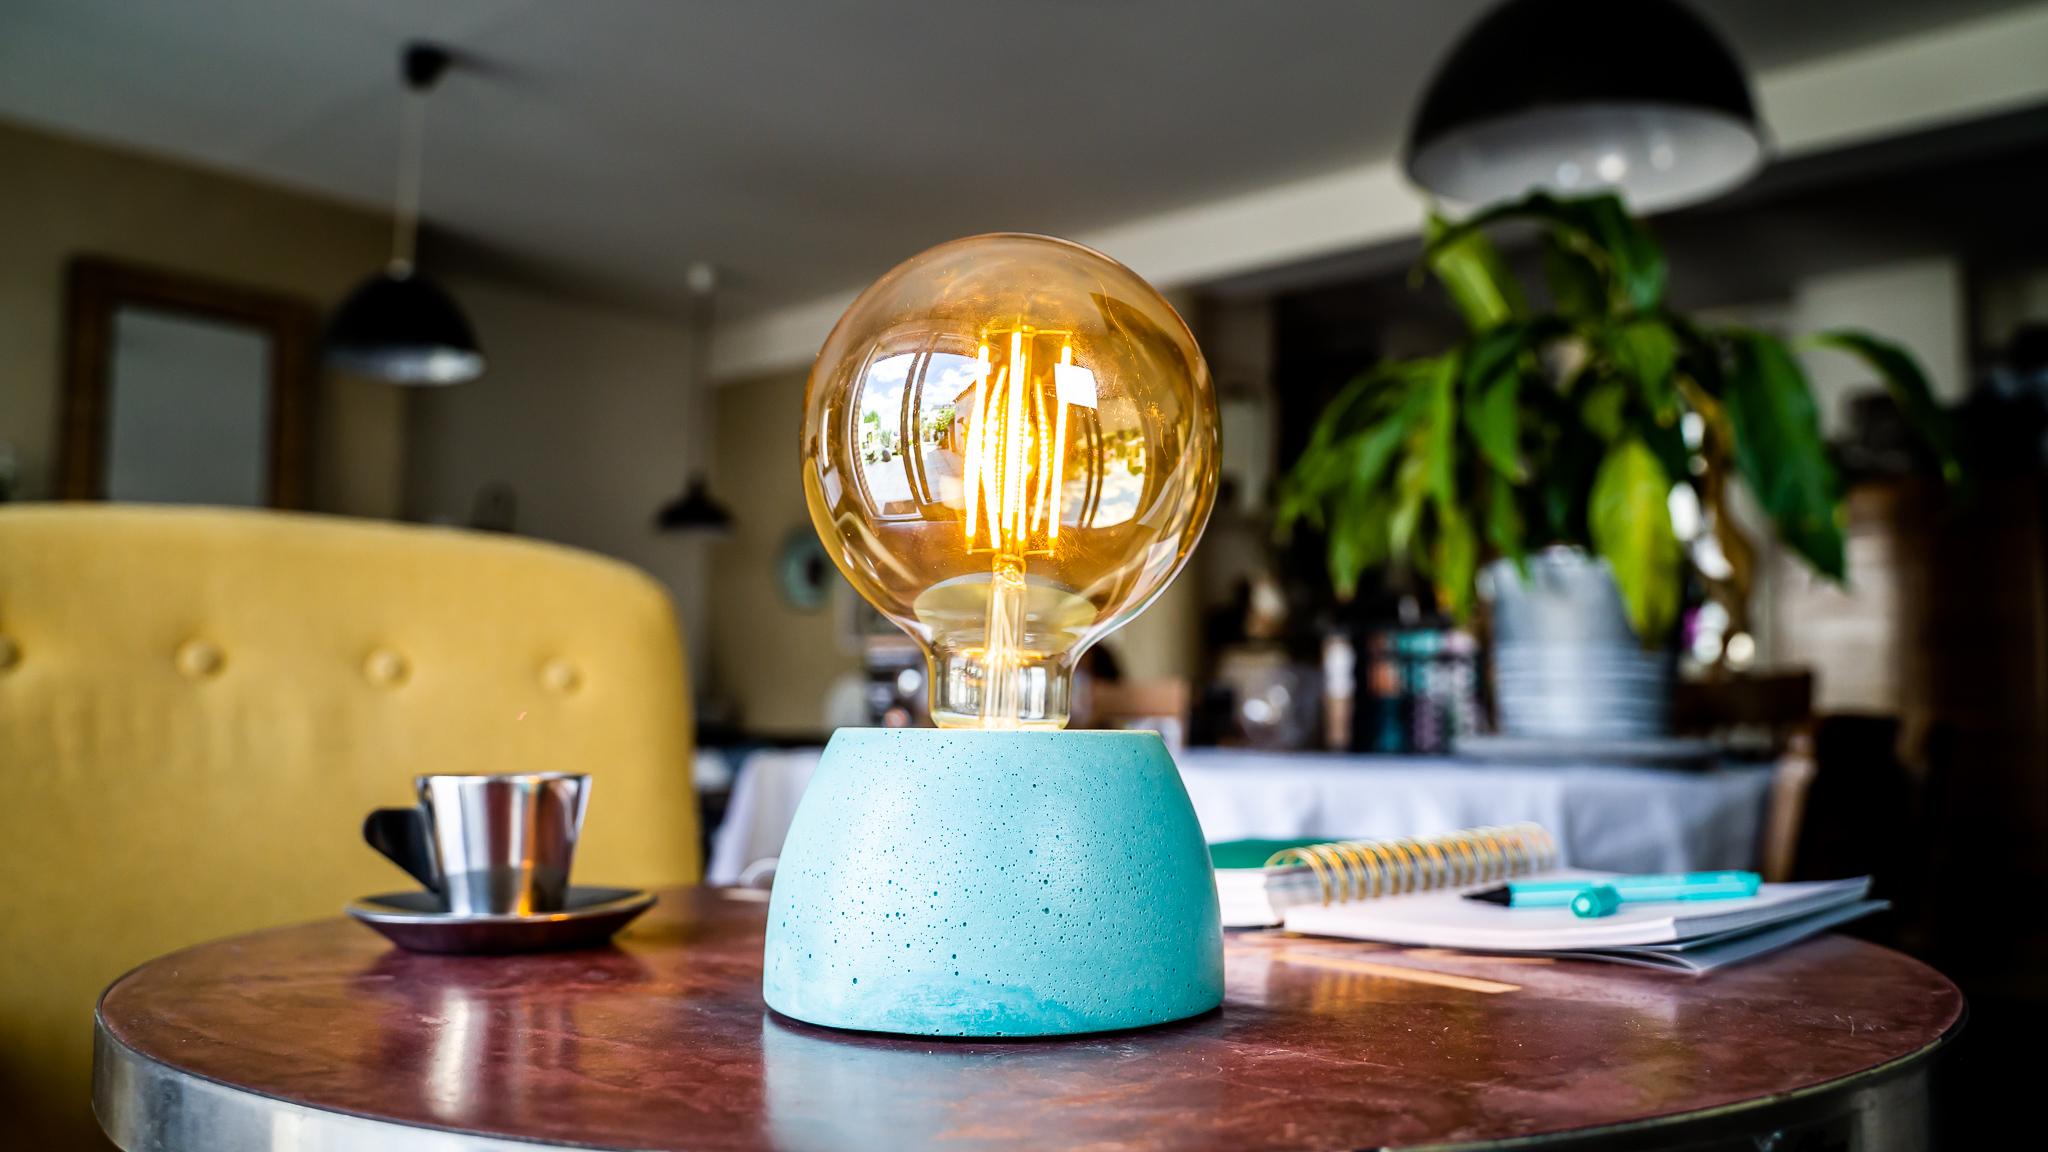 Lampe dôme en béton turquoise fabrication artisanale